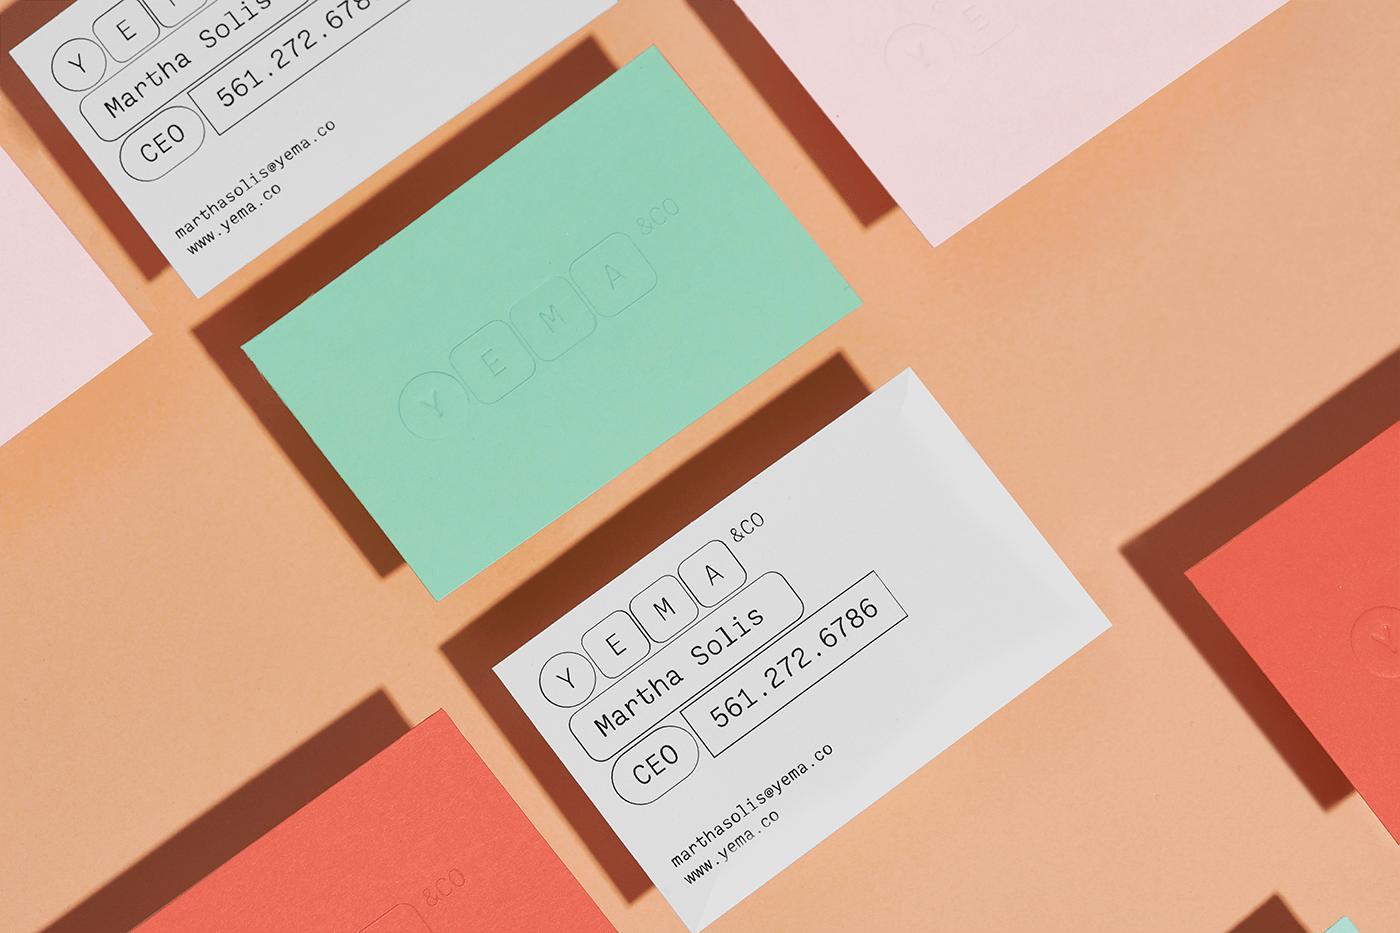 branding  sistema visual language color palette yema graphic sistem tecnology graphic design  good design brand